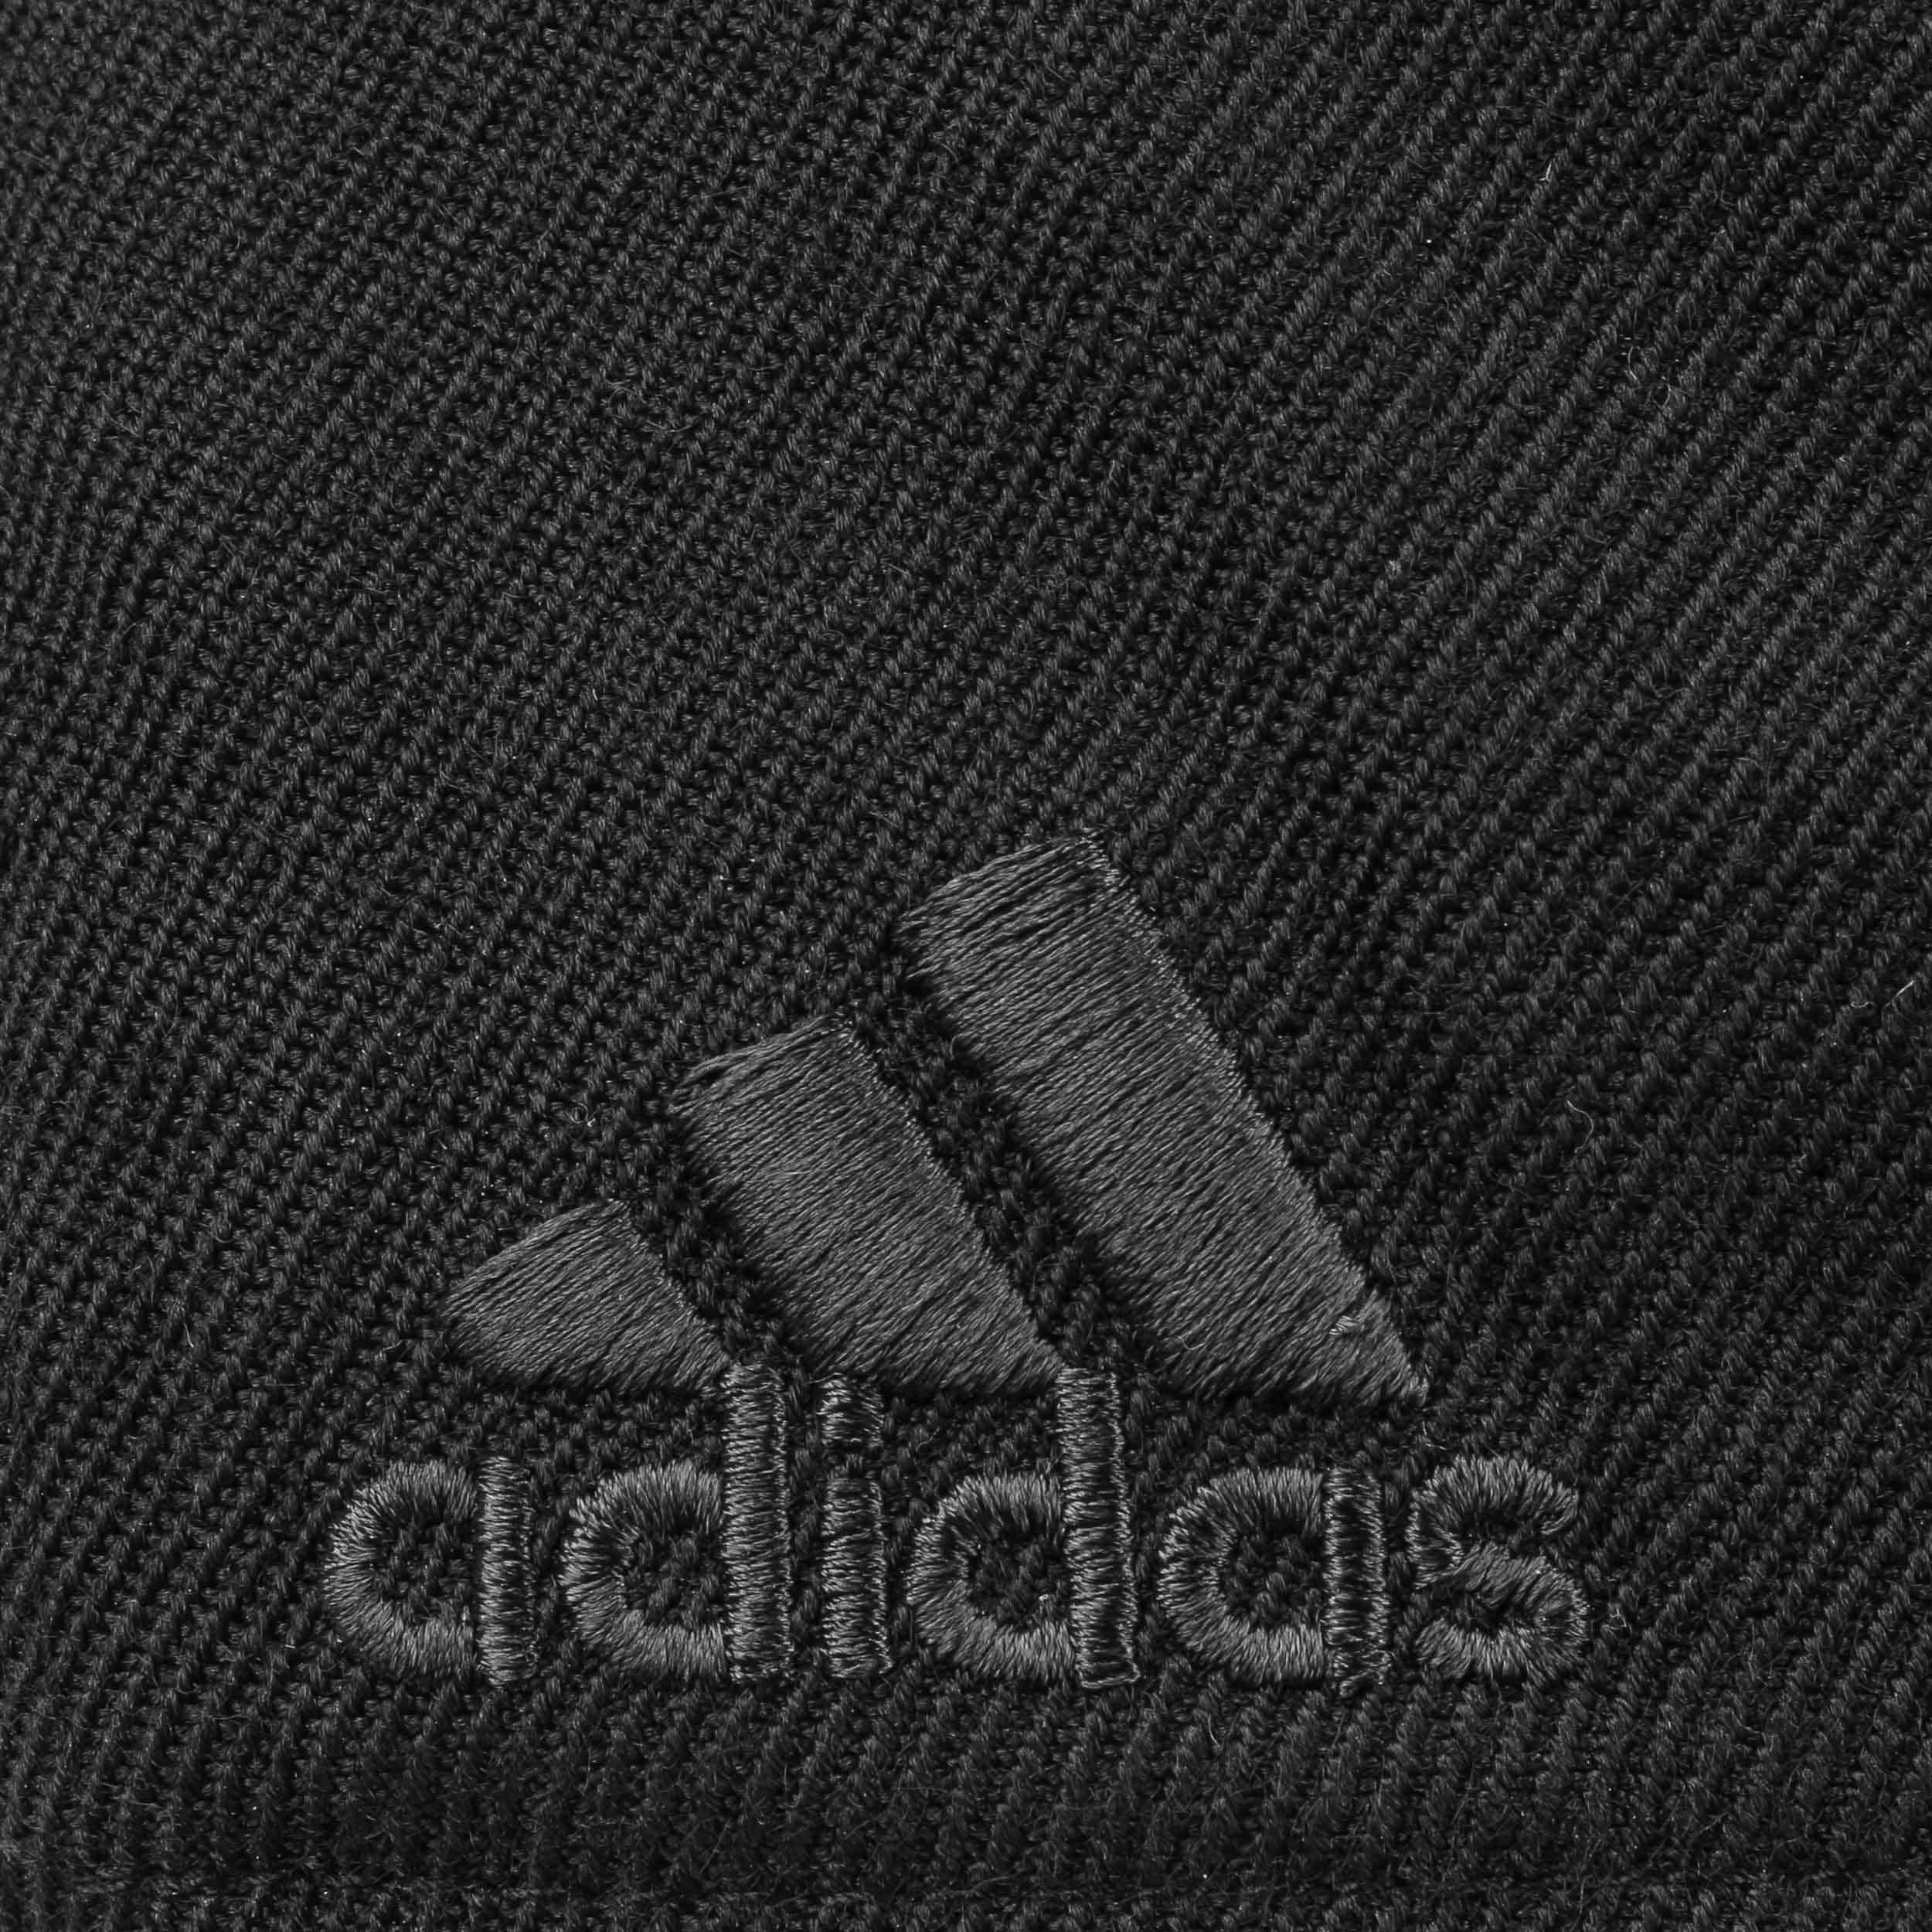 b68afee166a ... DFB Home Snapback Cap by adidas - black 5 ...